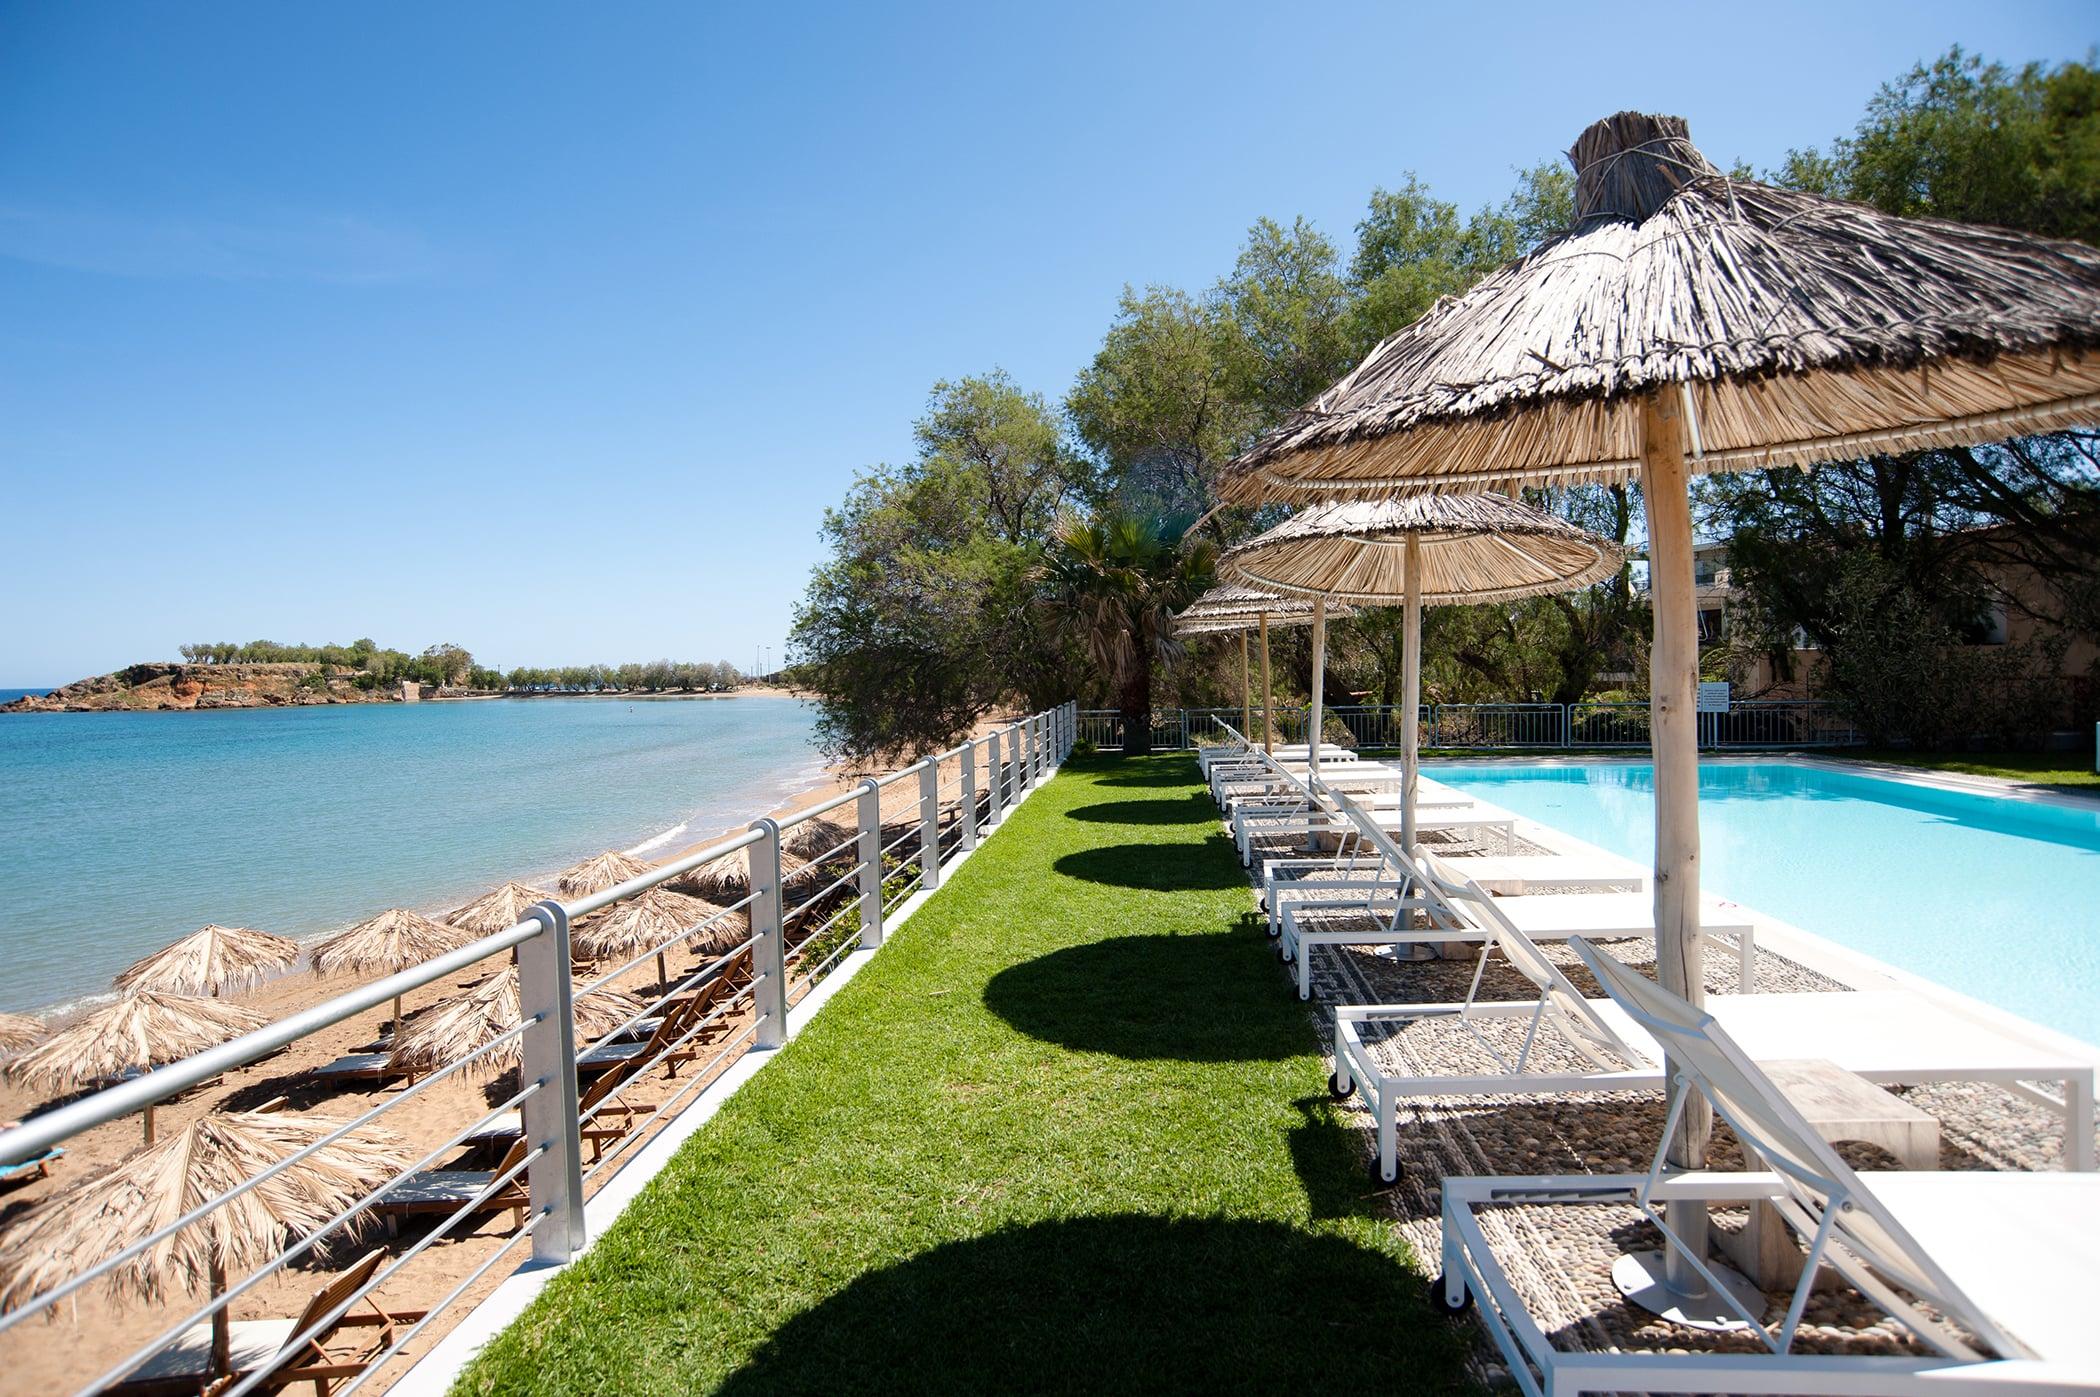 Ammos hotel crete hotel beach resort design style for Design hotel crete